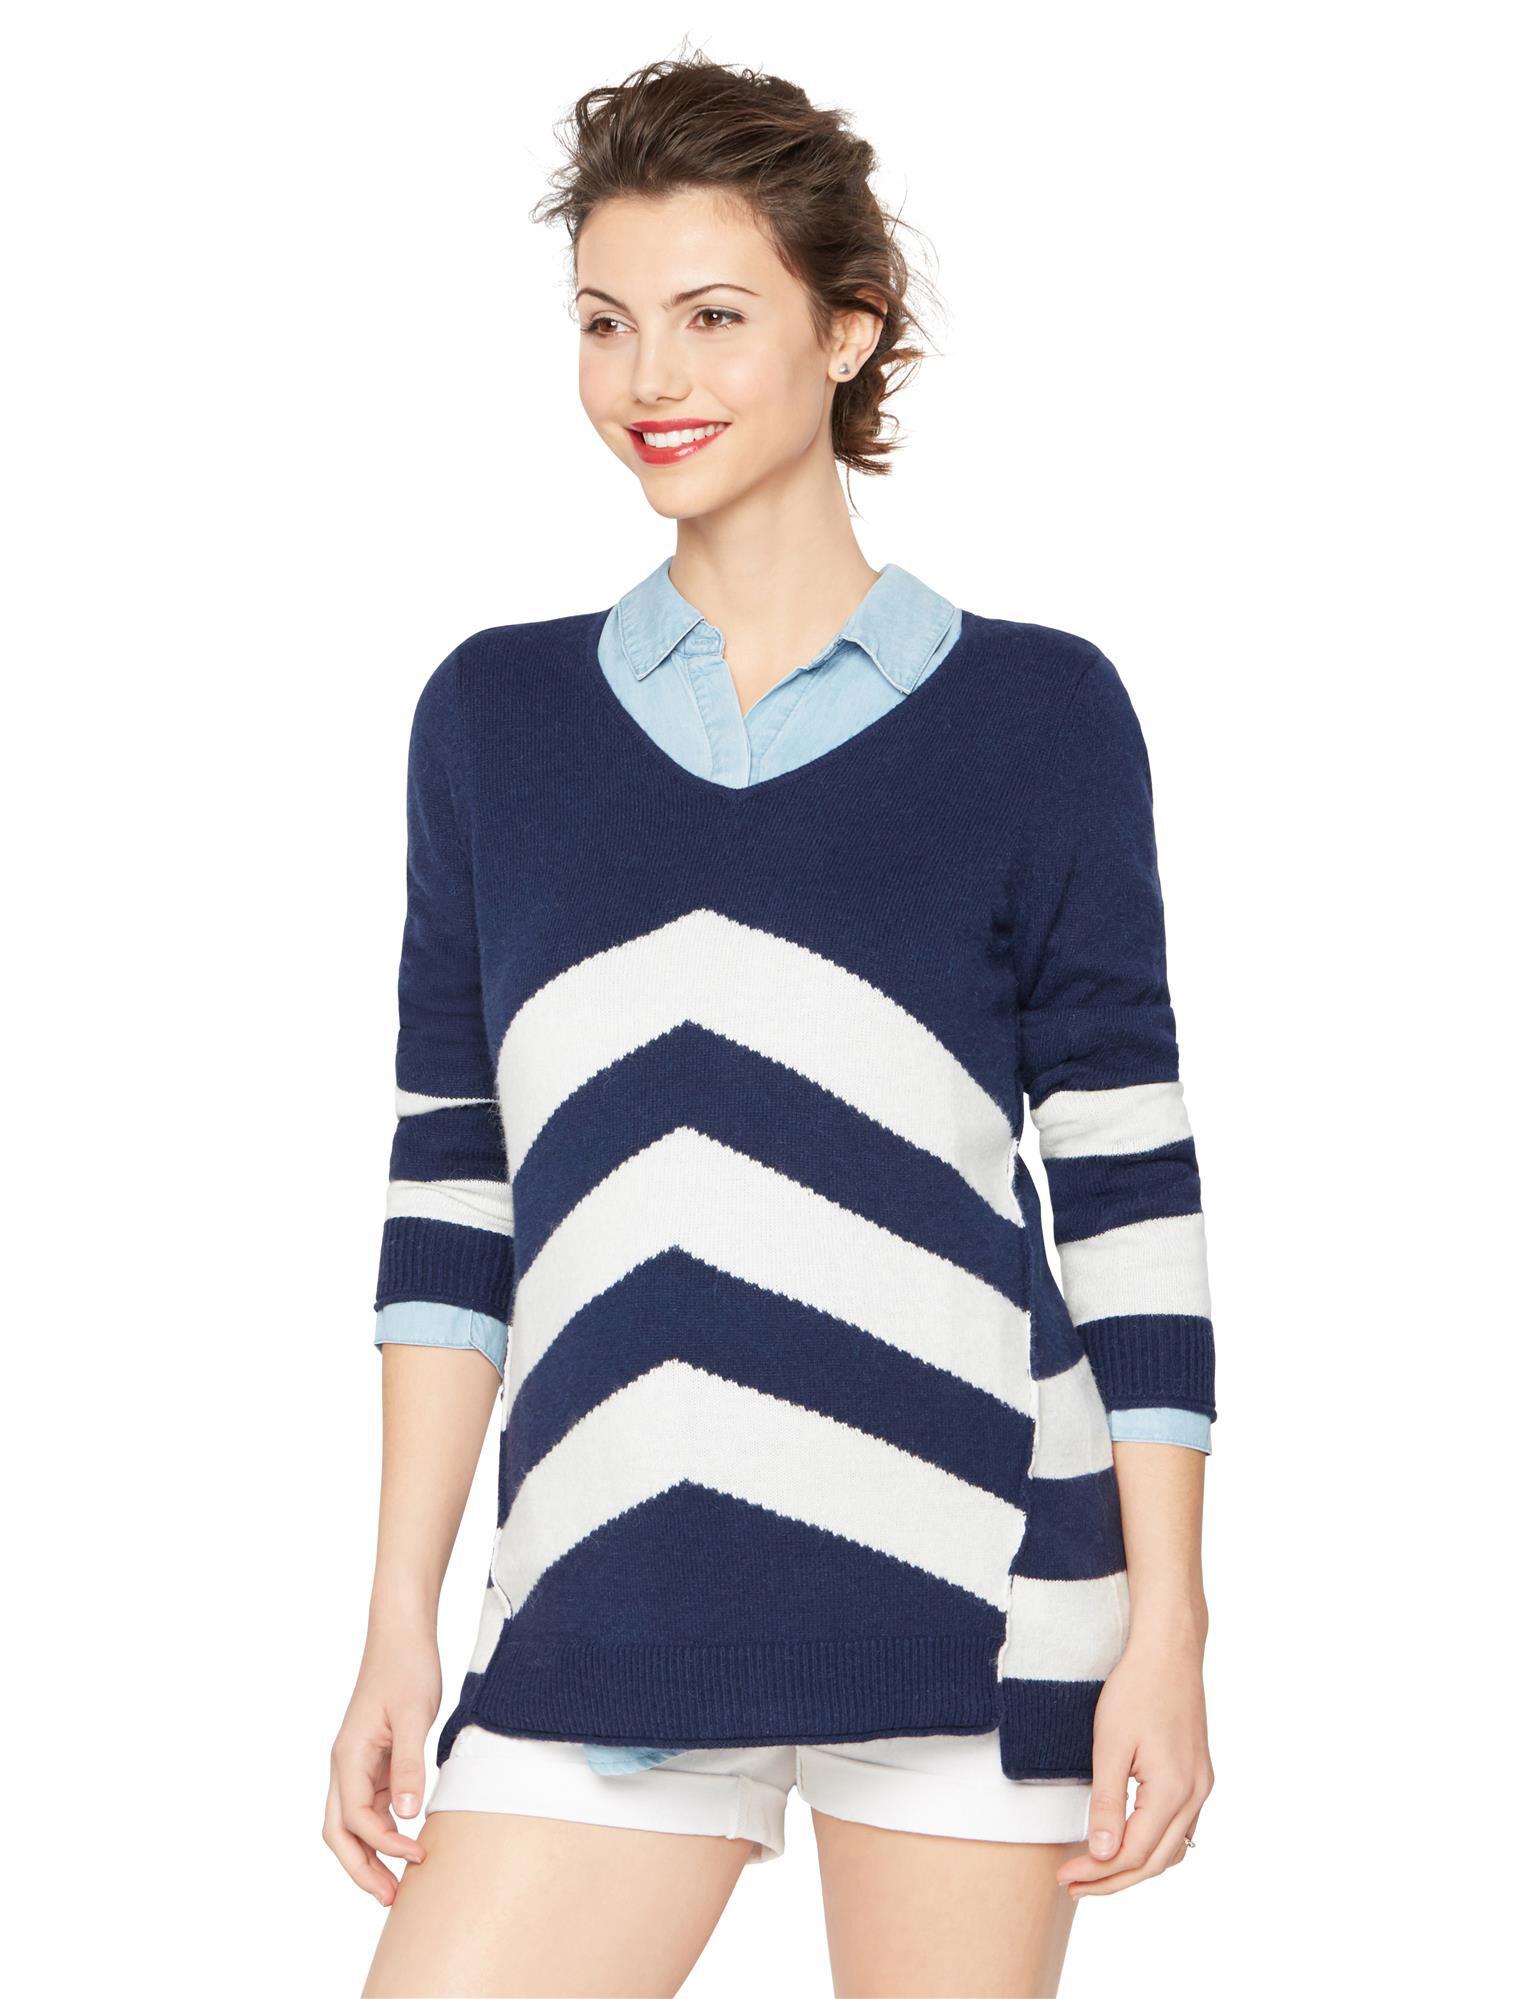 Chevron Stripe Maternity Sweater